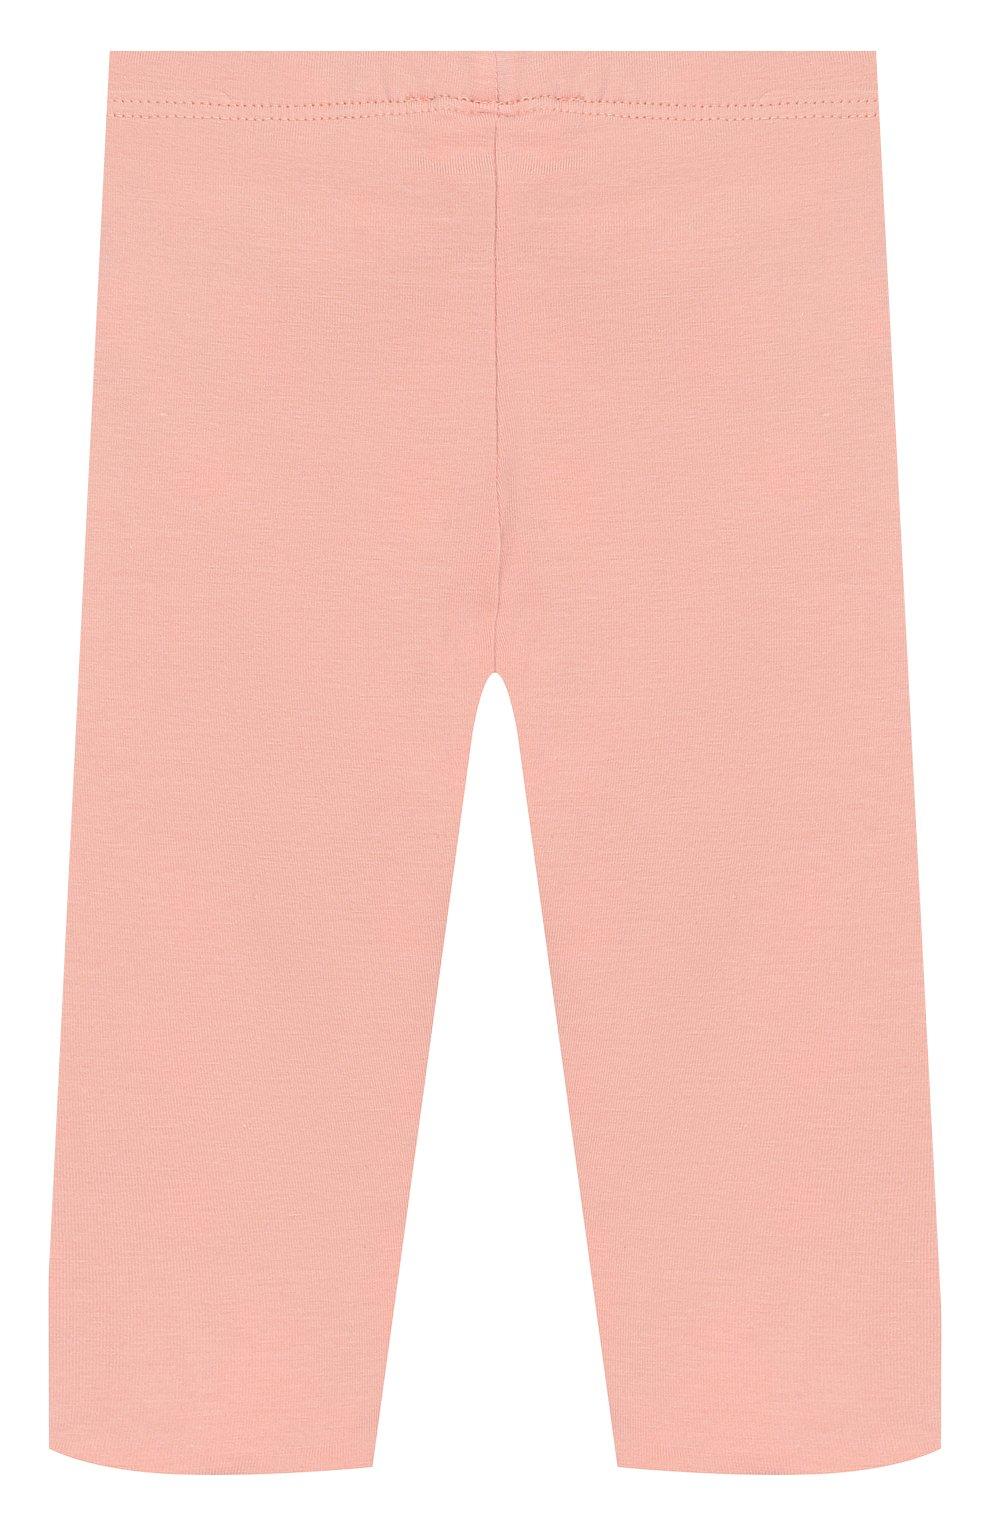 Детские двусторонние леггинсы KENZO розового цвета, арт. KP24017 | Фото 2